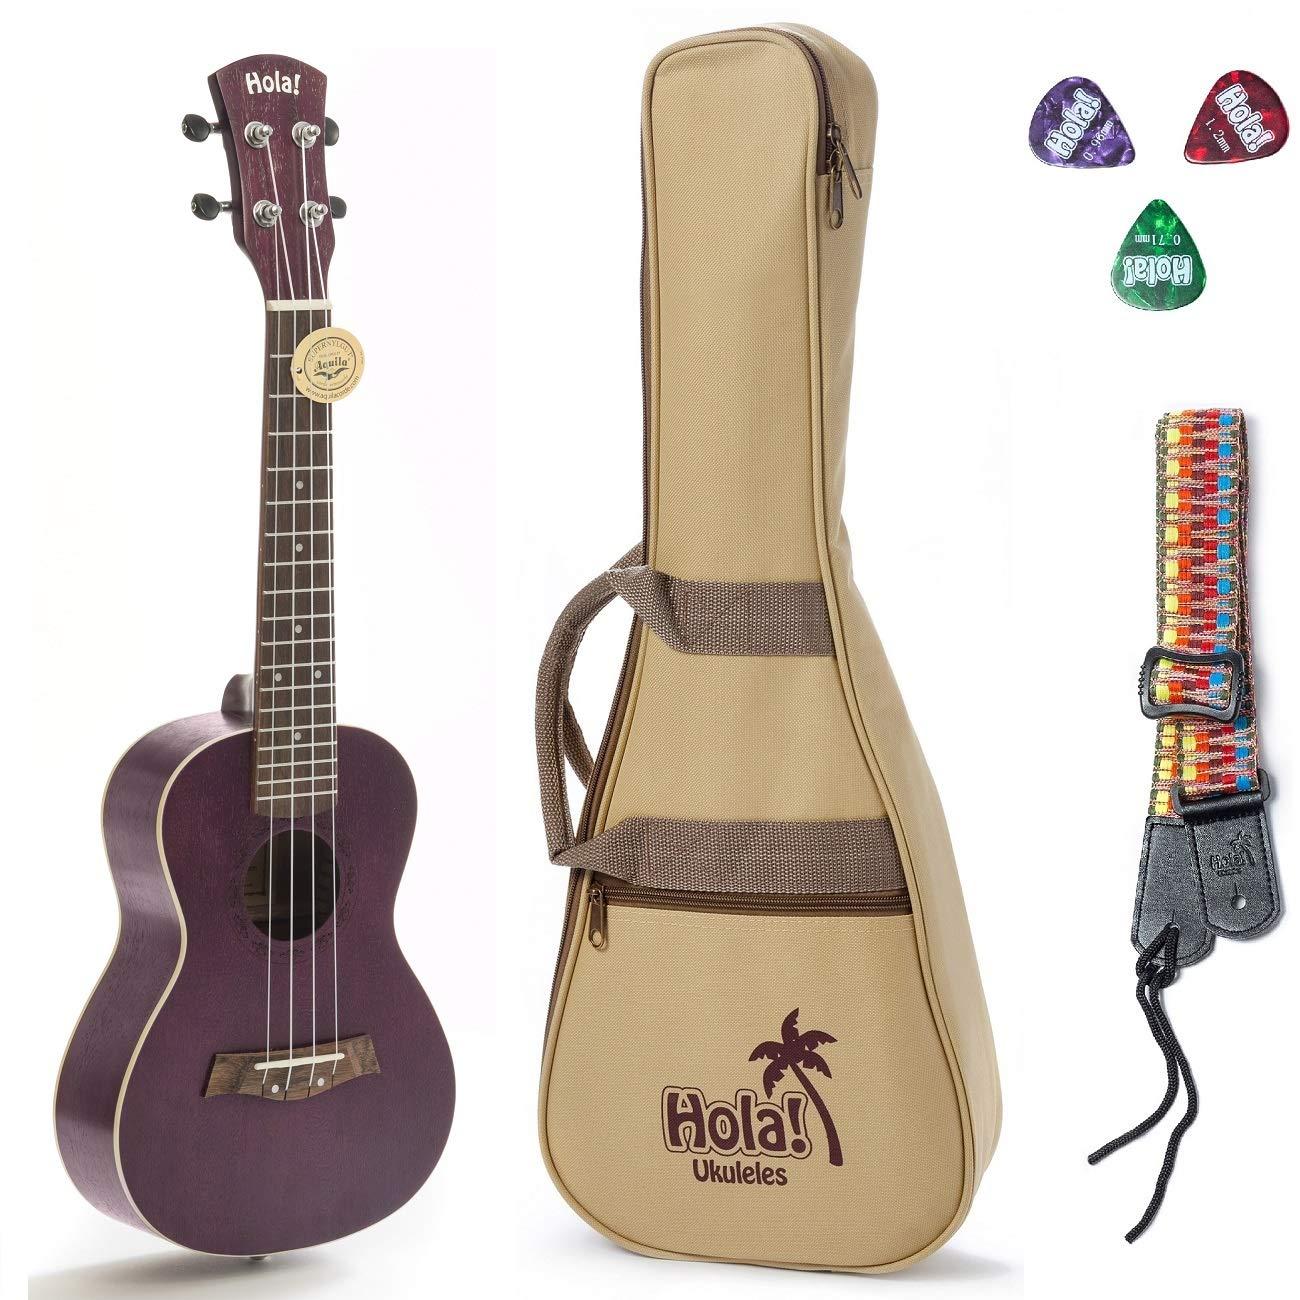 Strap and Picks Music Padded Gig Bag Model HM-124ZW+ Concert Ukulele Deluxe Series by Hola Bundle Includes: 24 Inch Zebrawood Ukulele with Aquila Nylgut Strings Installed